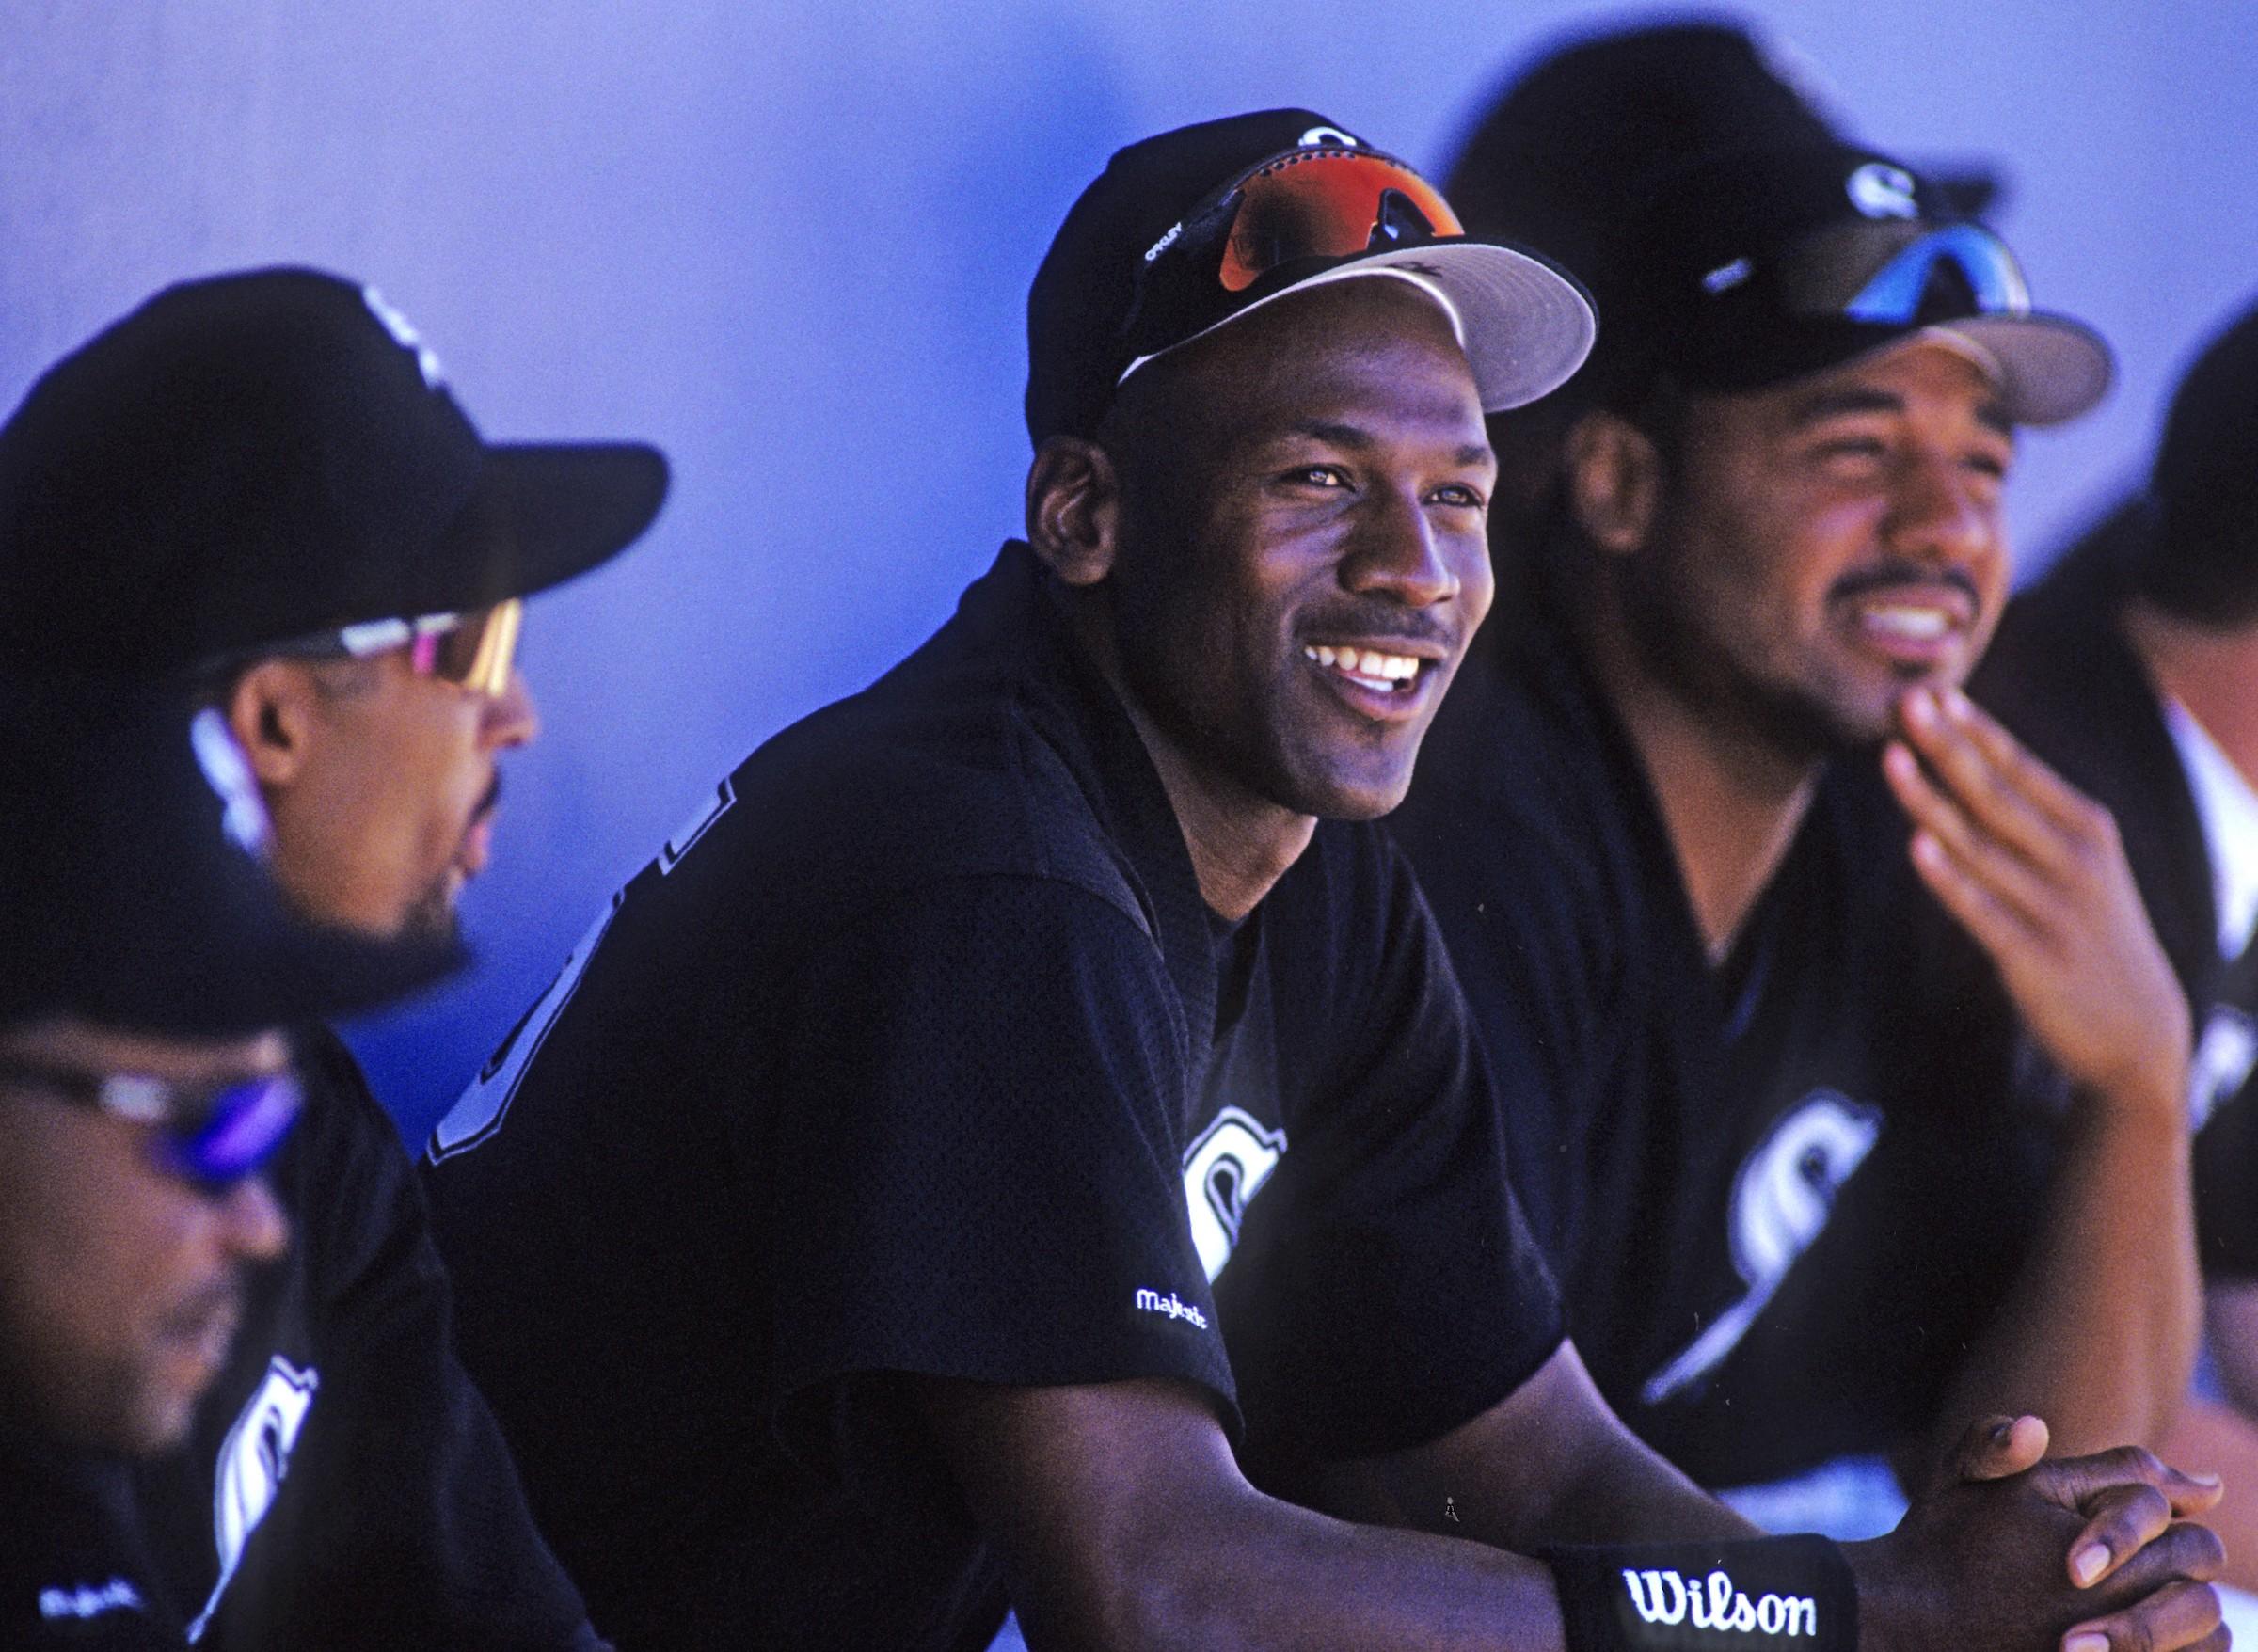 Michael Jordan, the Chicago White Sox Right Fielder | by Chicago White Sox  | Inside the White Sox